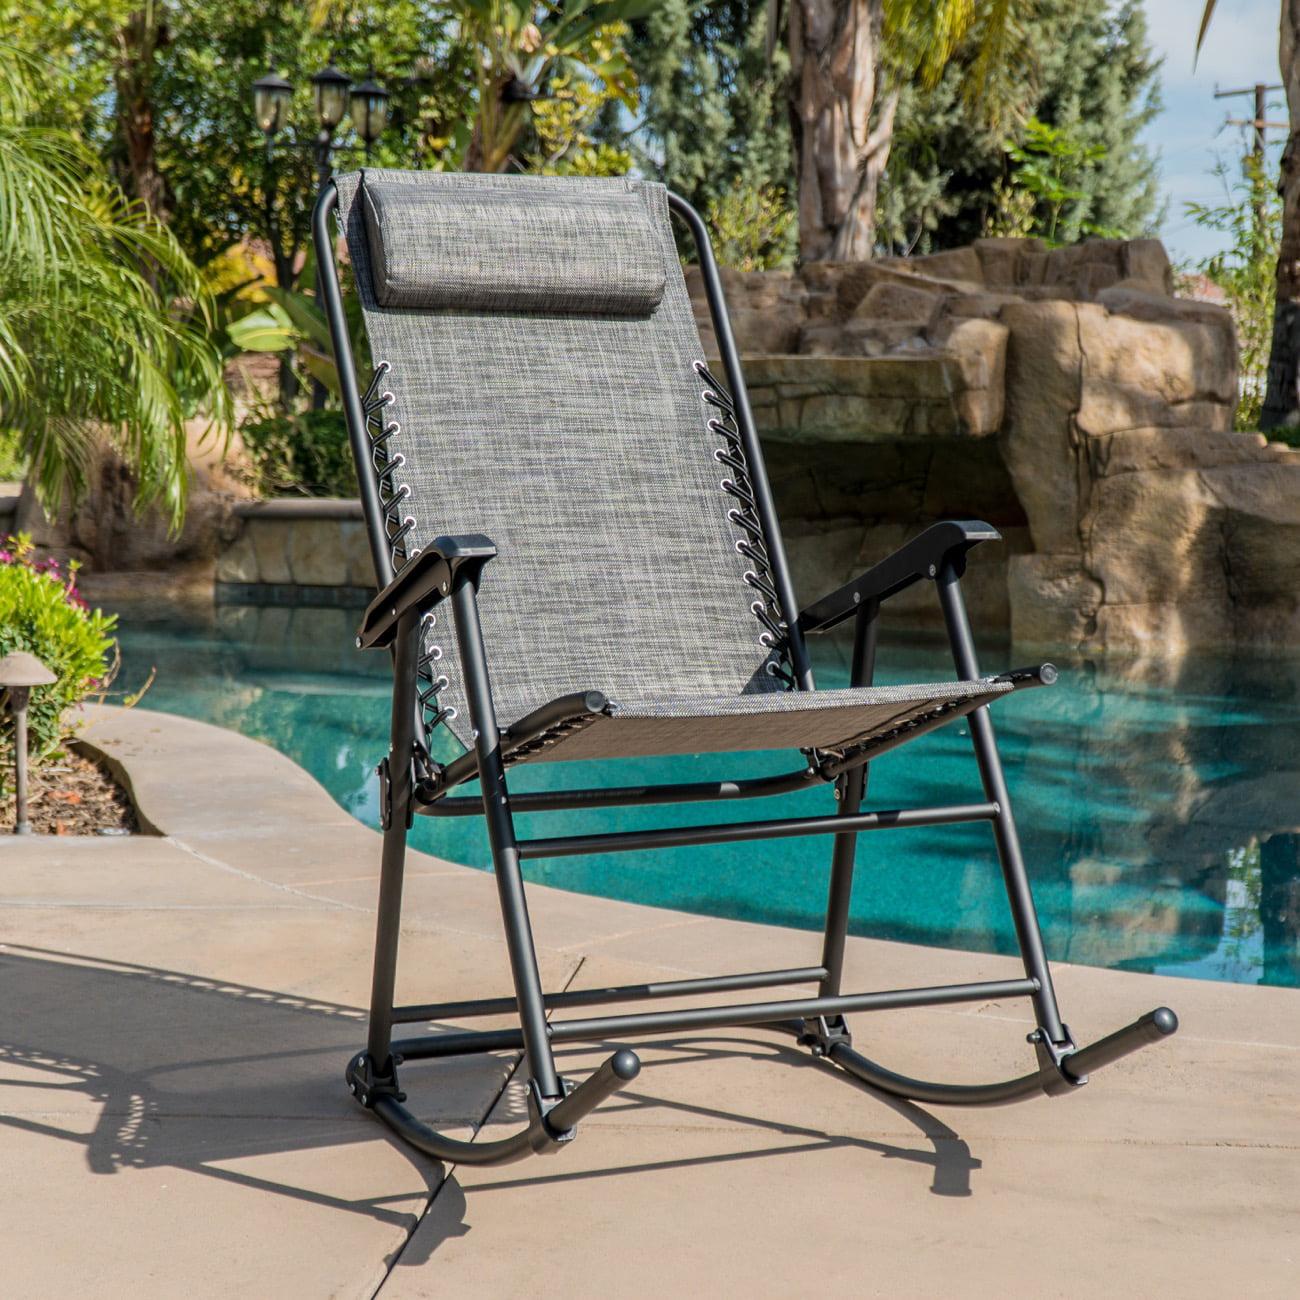 Belleze bungee suspension zero gravity chair folding rocking chair head pillow outdoor backyard canopy gray